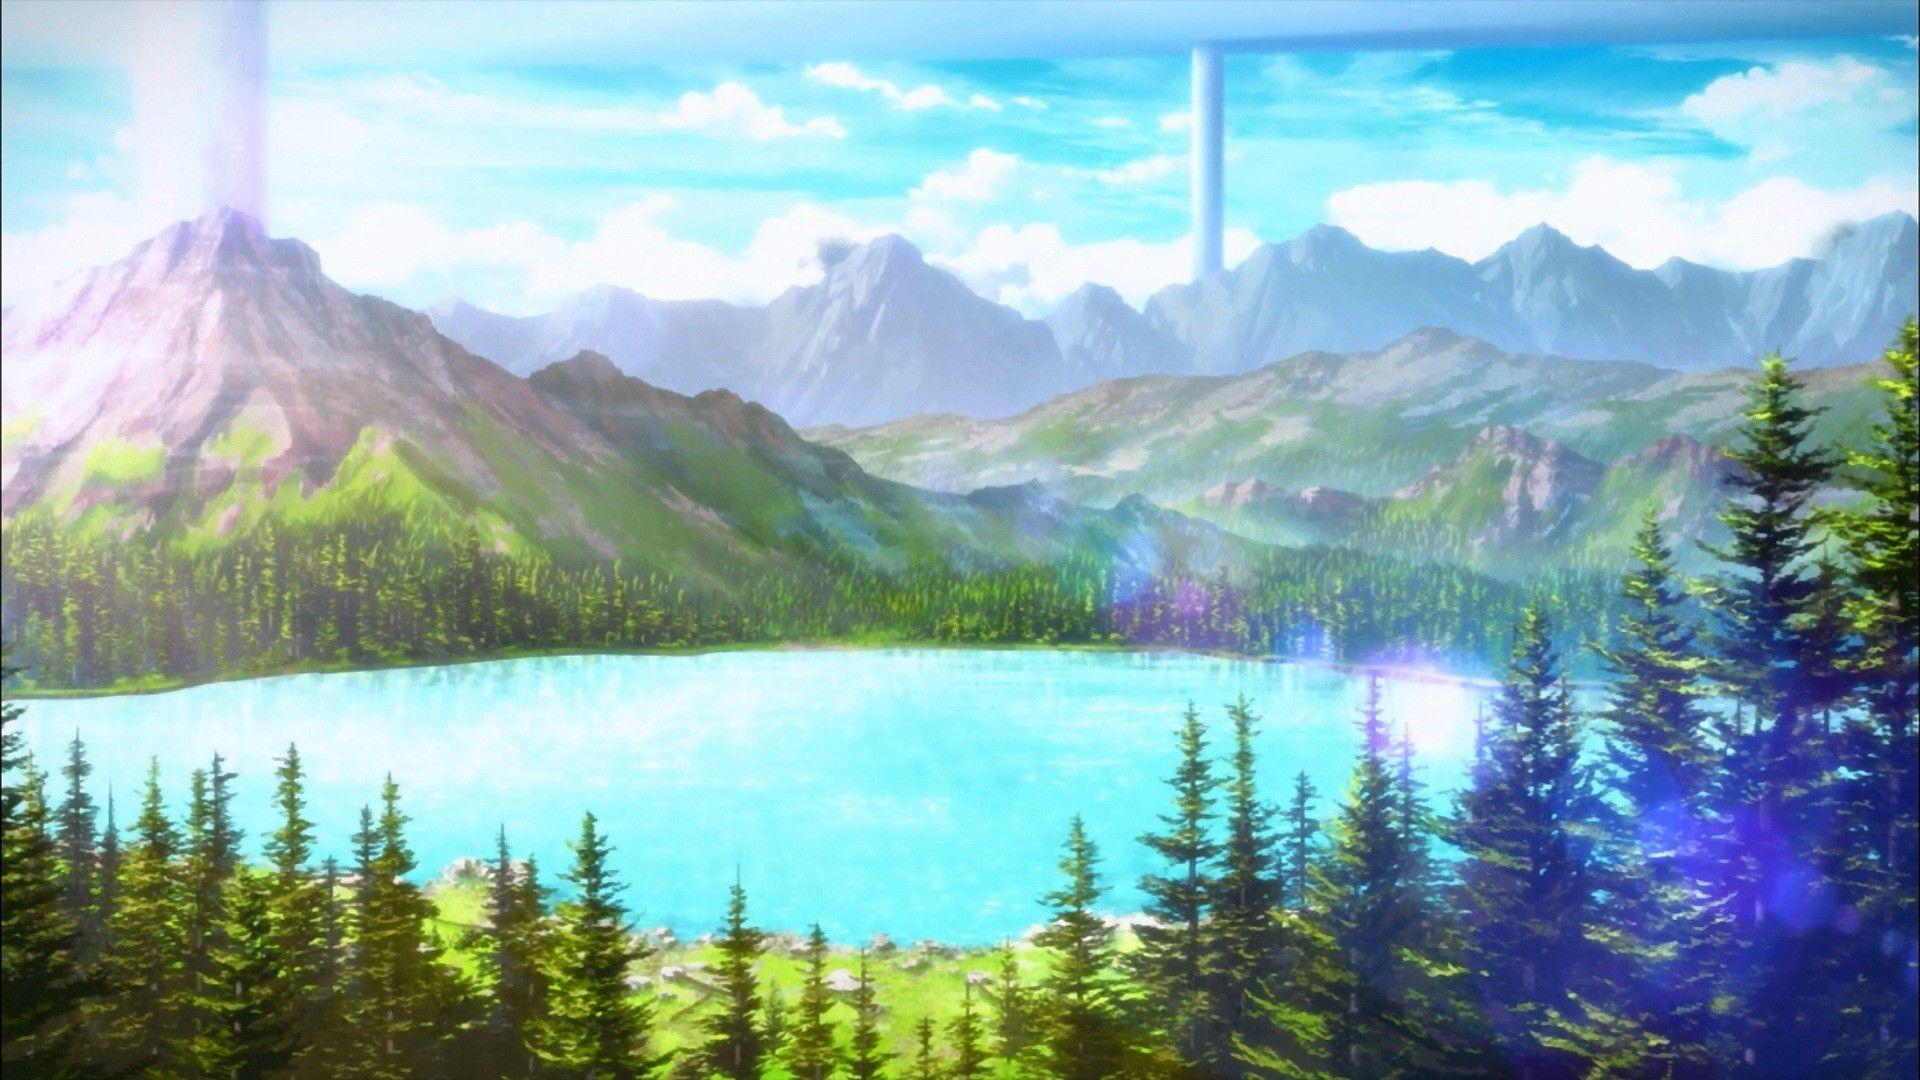 Anime 1920x1080 anime landscape Sword Art Online mountains